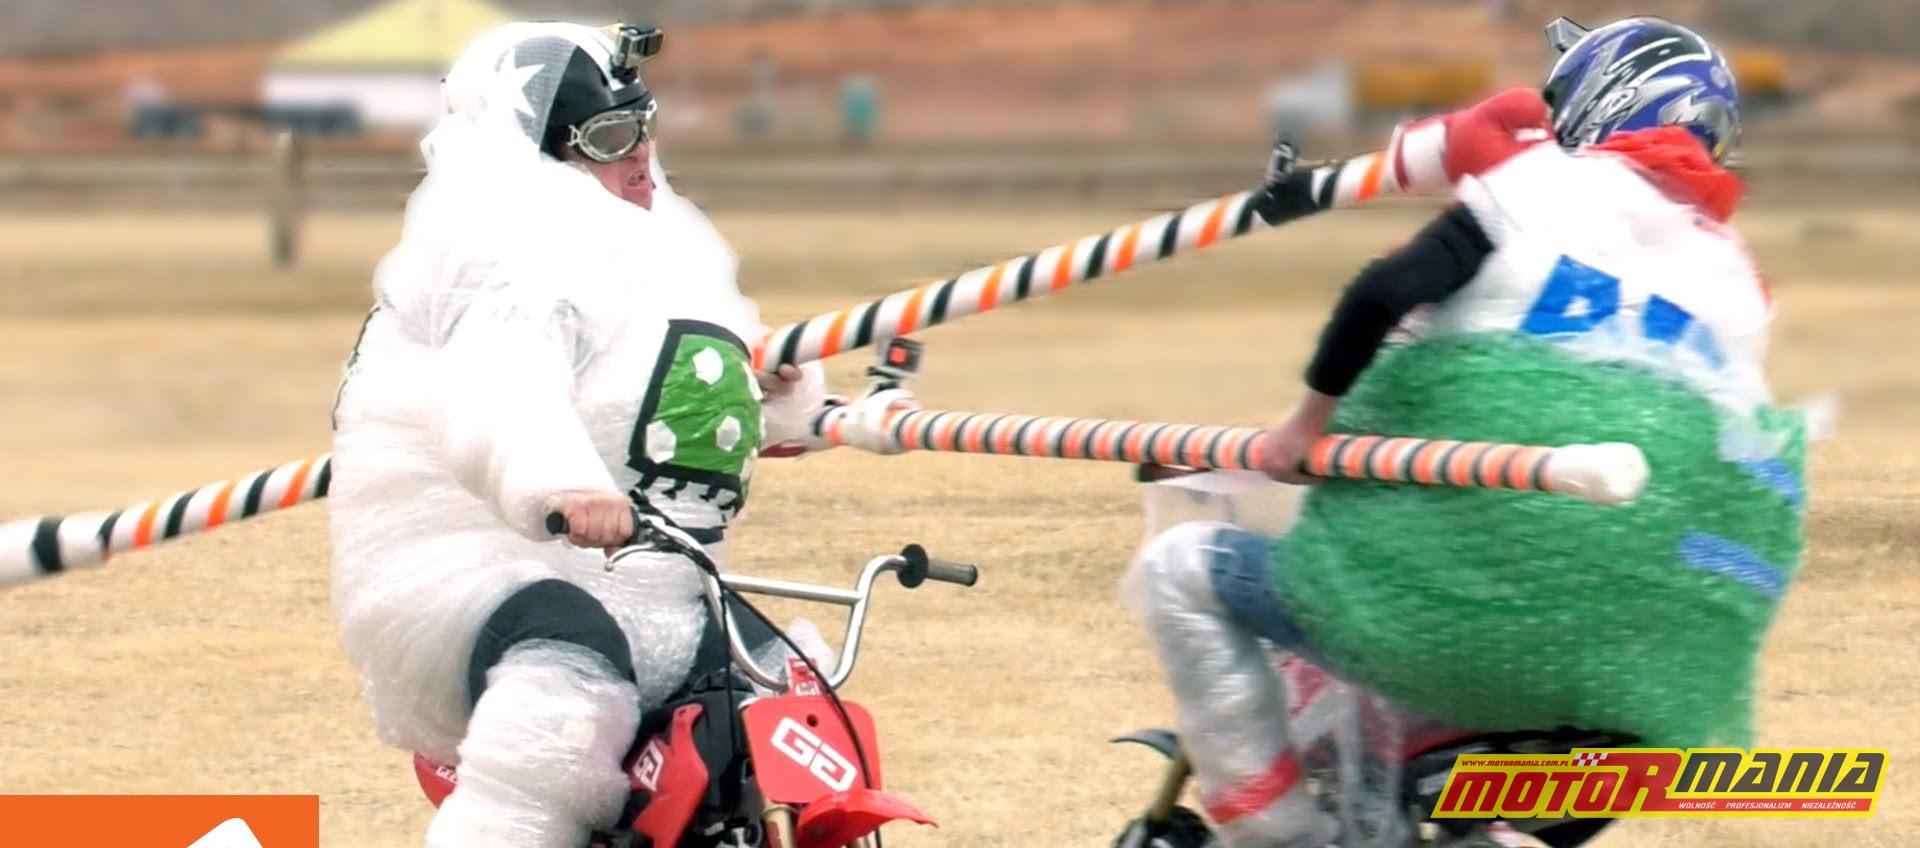 turniej rycerski na motocyklach